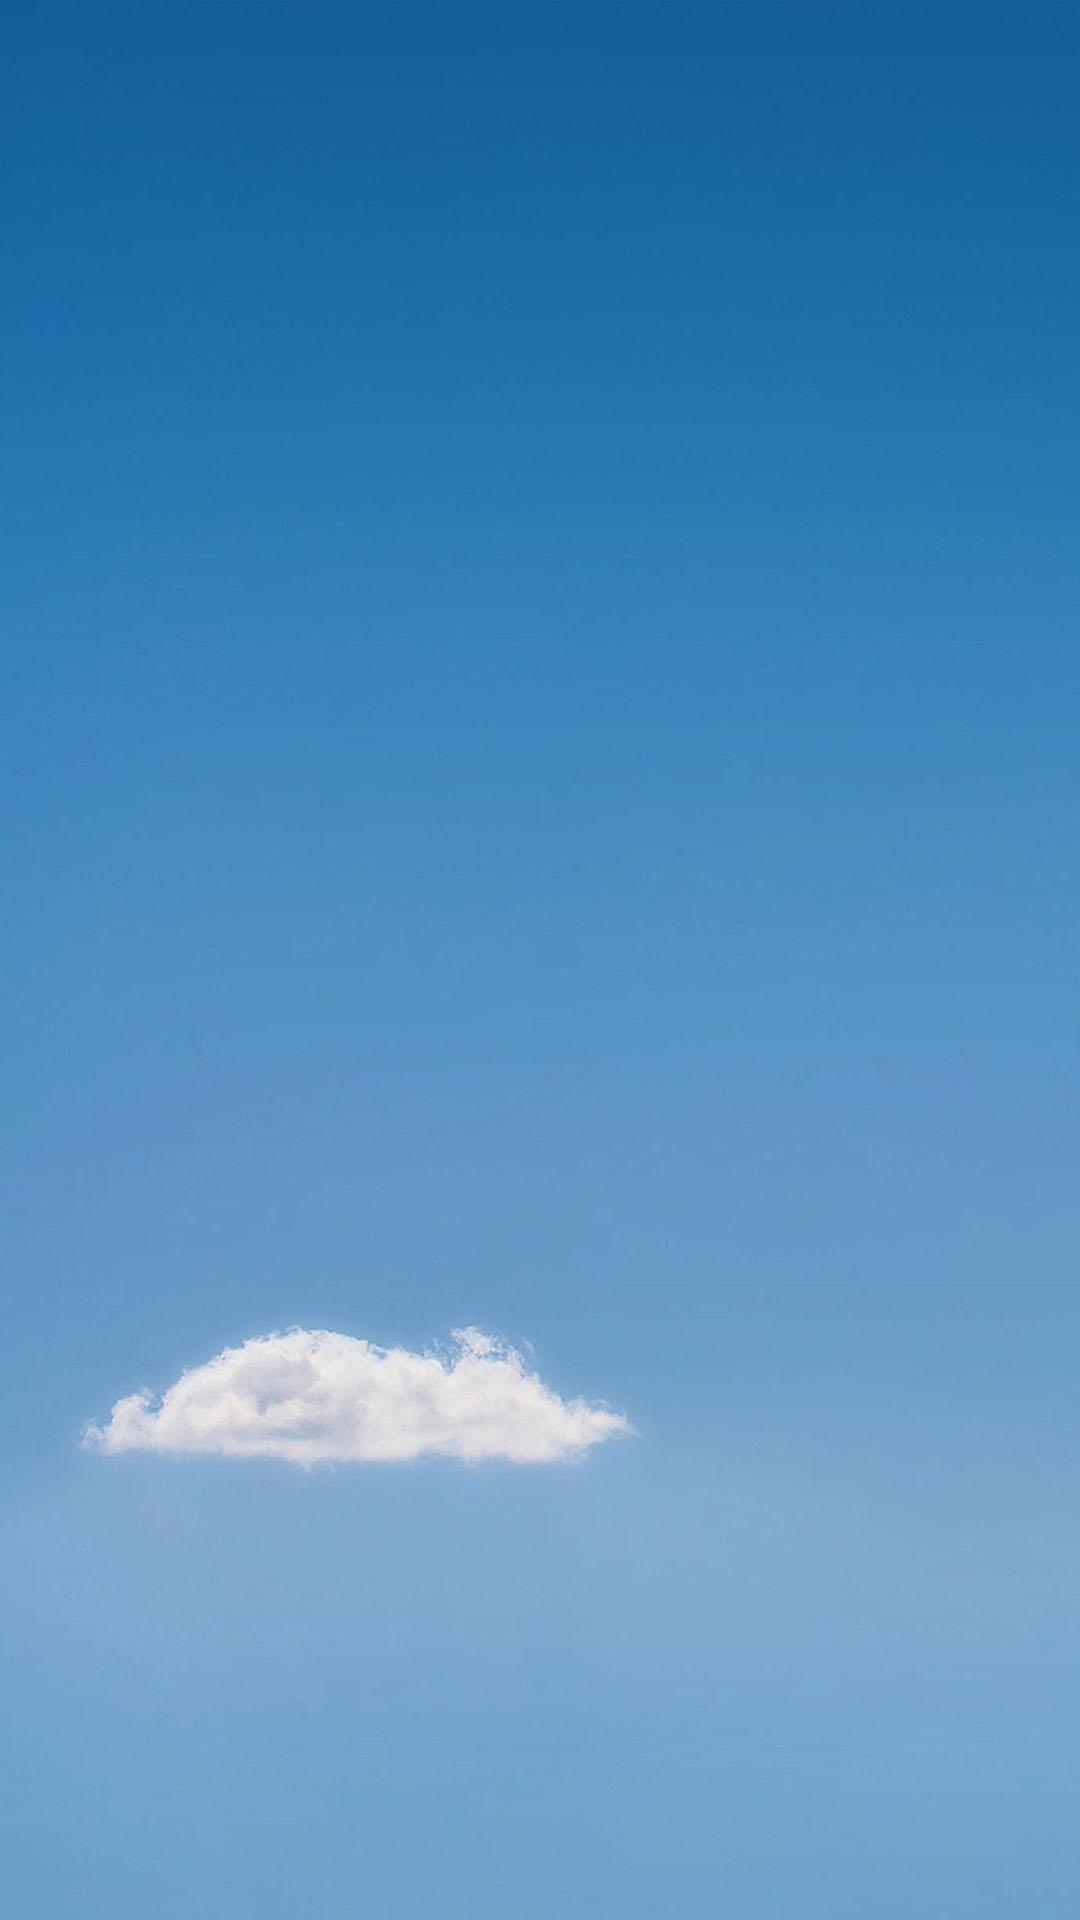 One Cloud Htc One Wallpaper